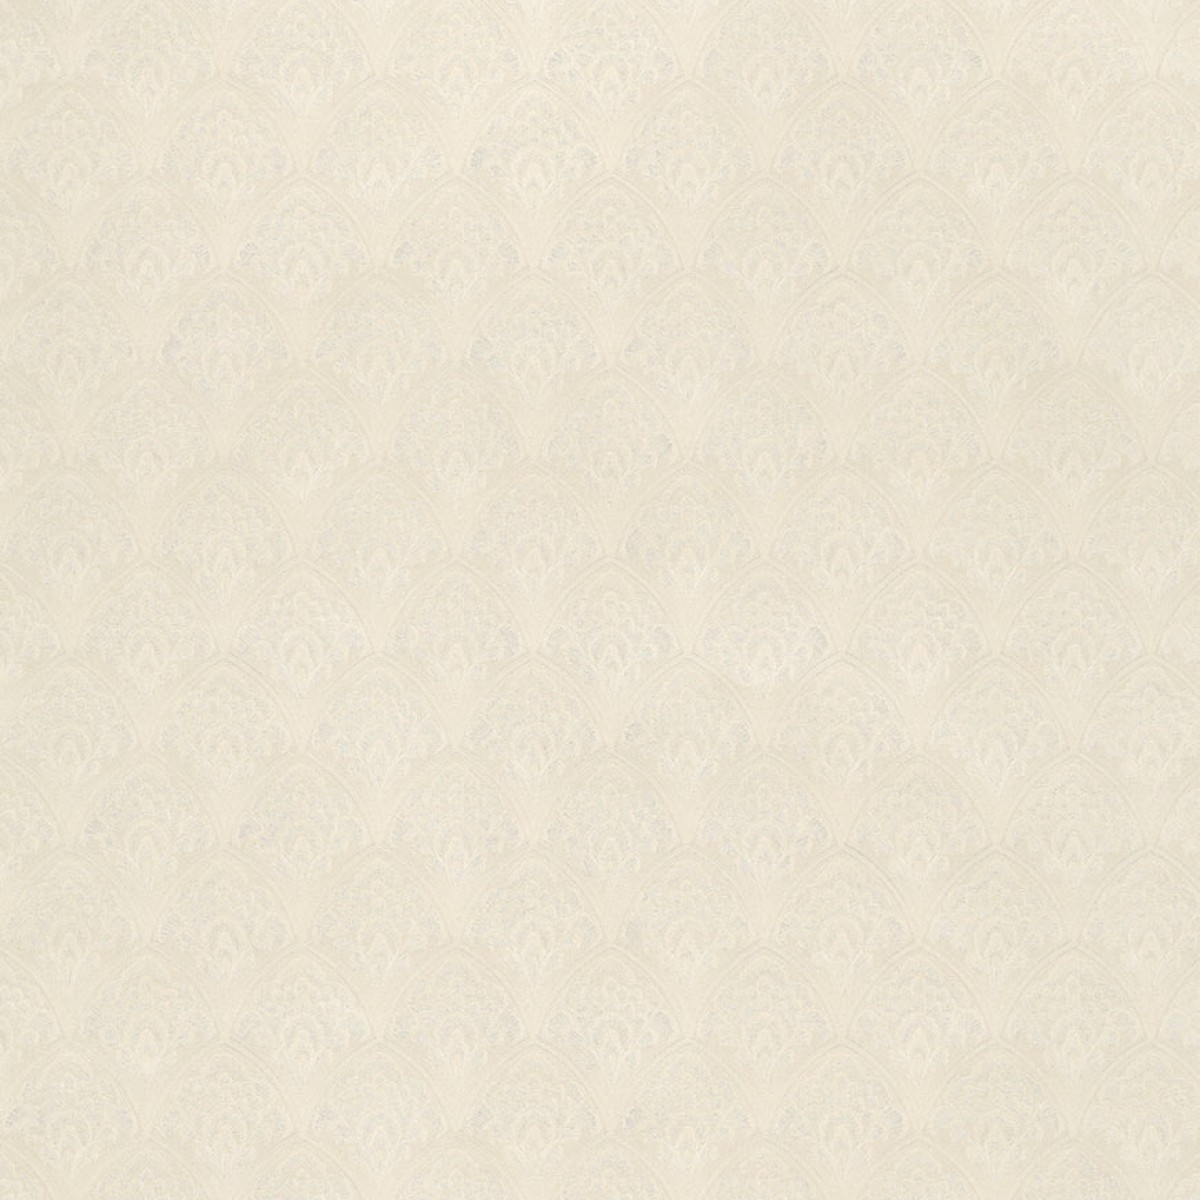 Tapet lavabil Chambord 36114, 5.2mp / rolă, Eijffinger